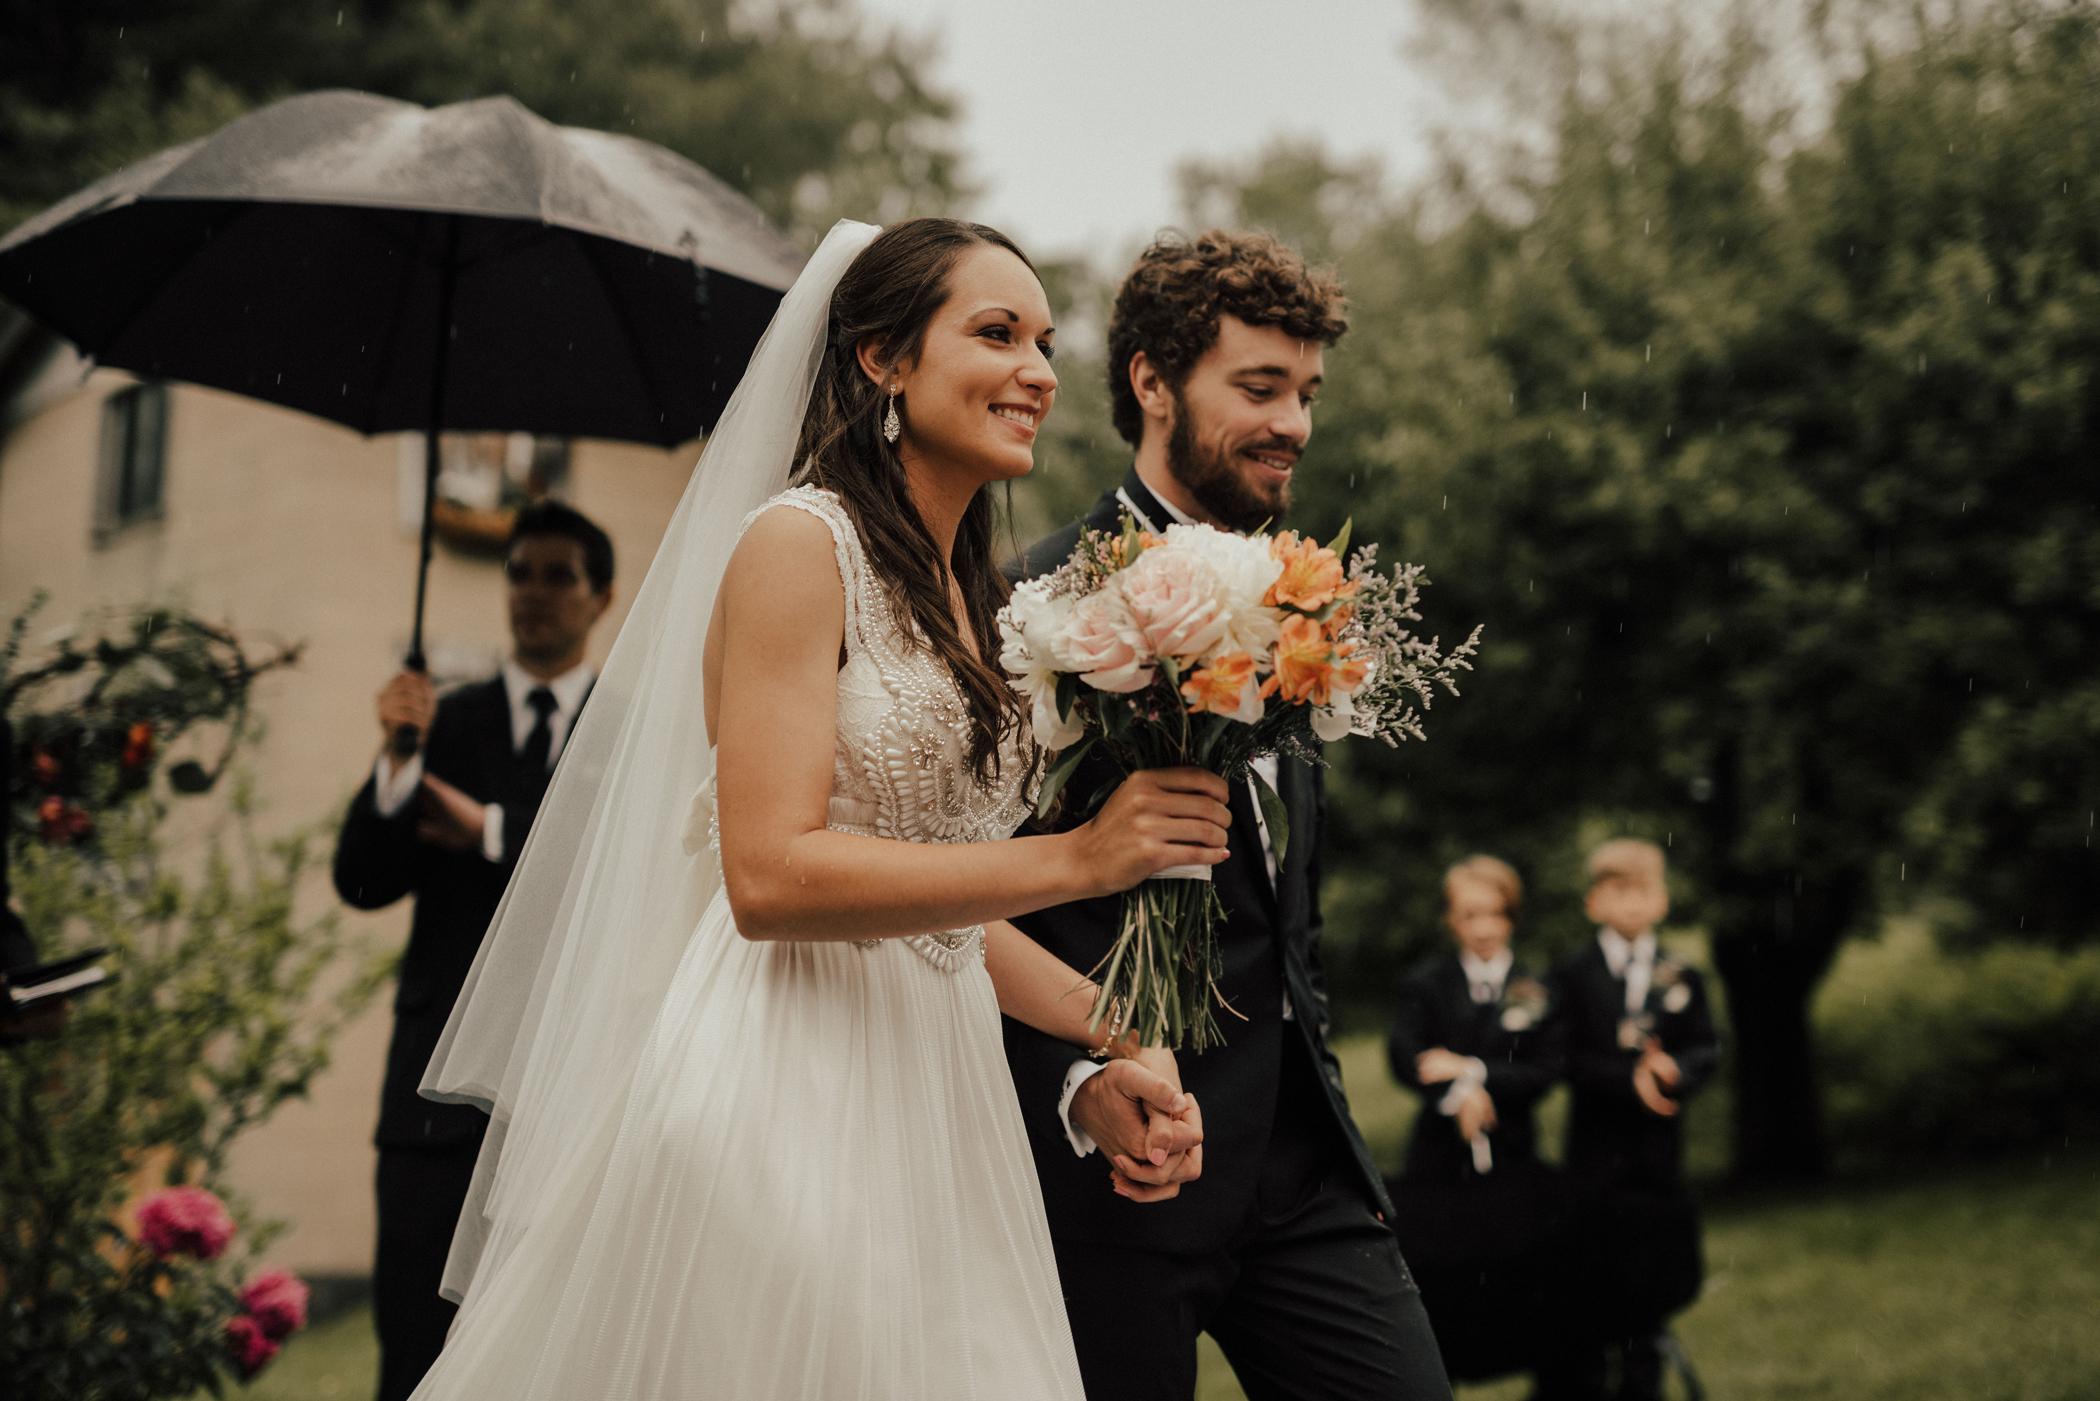 ErinKrespanPhotography_Wedding138.jpg